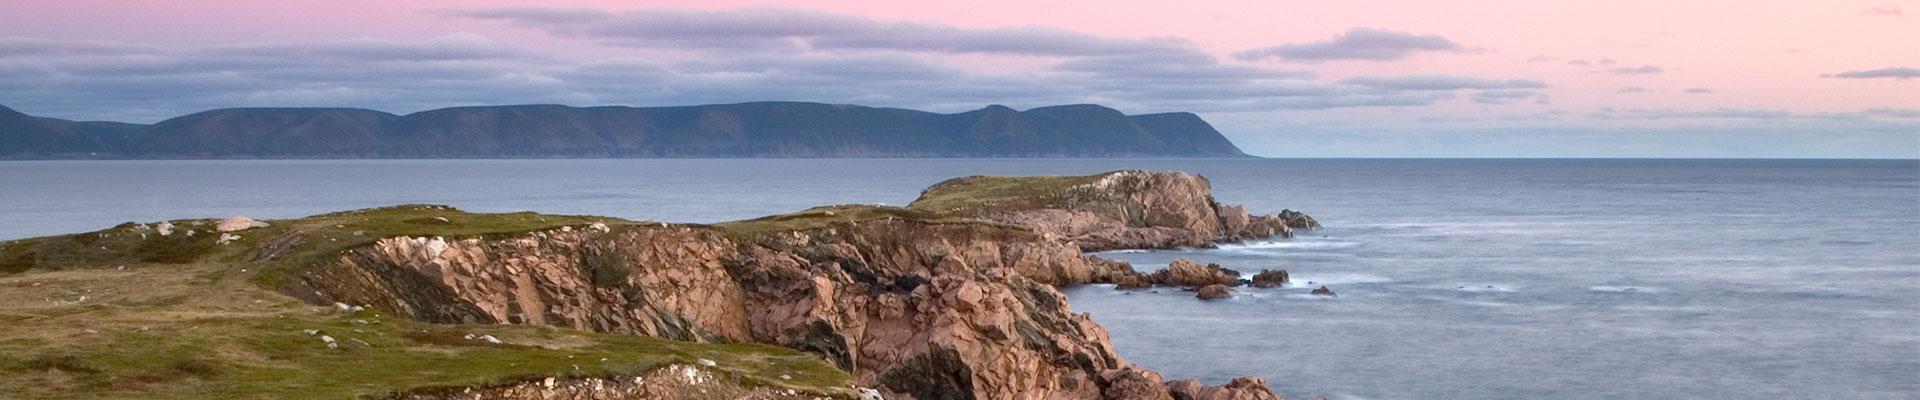 Fantasy RV Tours: 32 Day Atlantic Provinces Select (32CAPP-070620)